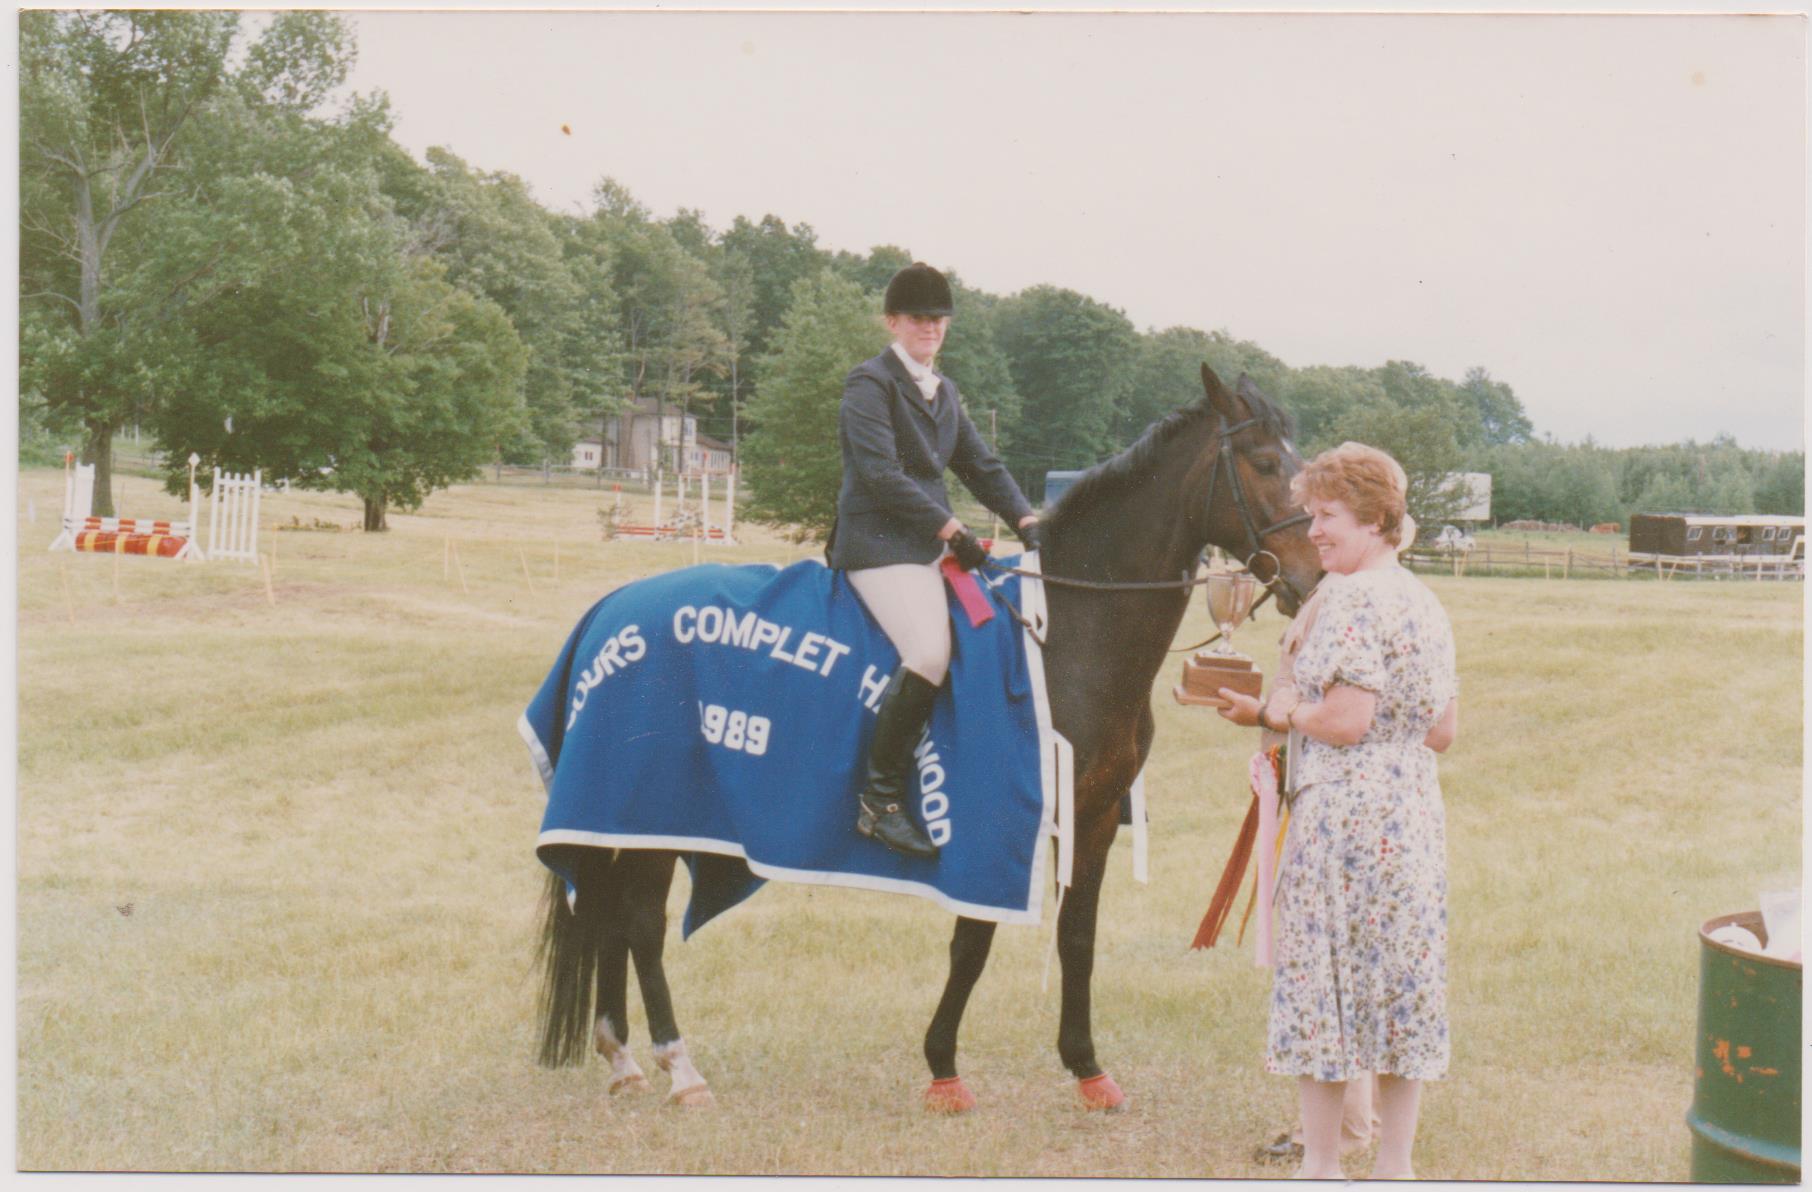 Ruth Allum riding Debonair (Marty) at Harmony Horse Trials 1989